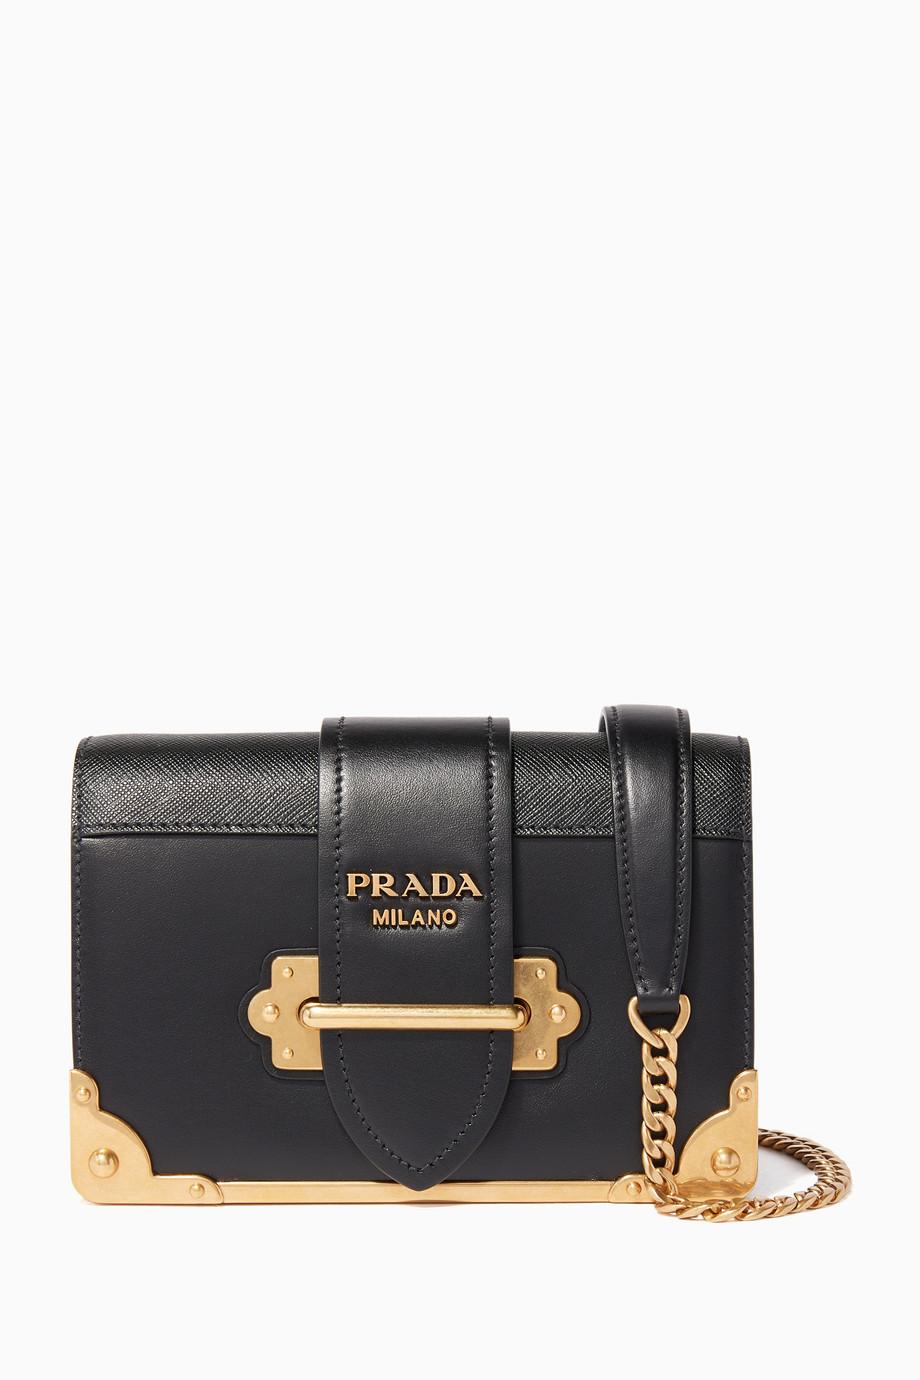 4d855d4dbc87 Shop Prada Black Black Mini Cahier Leather Shoulder Bag for Women ...